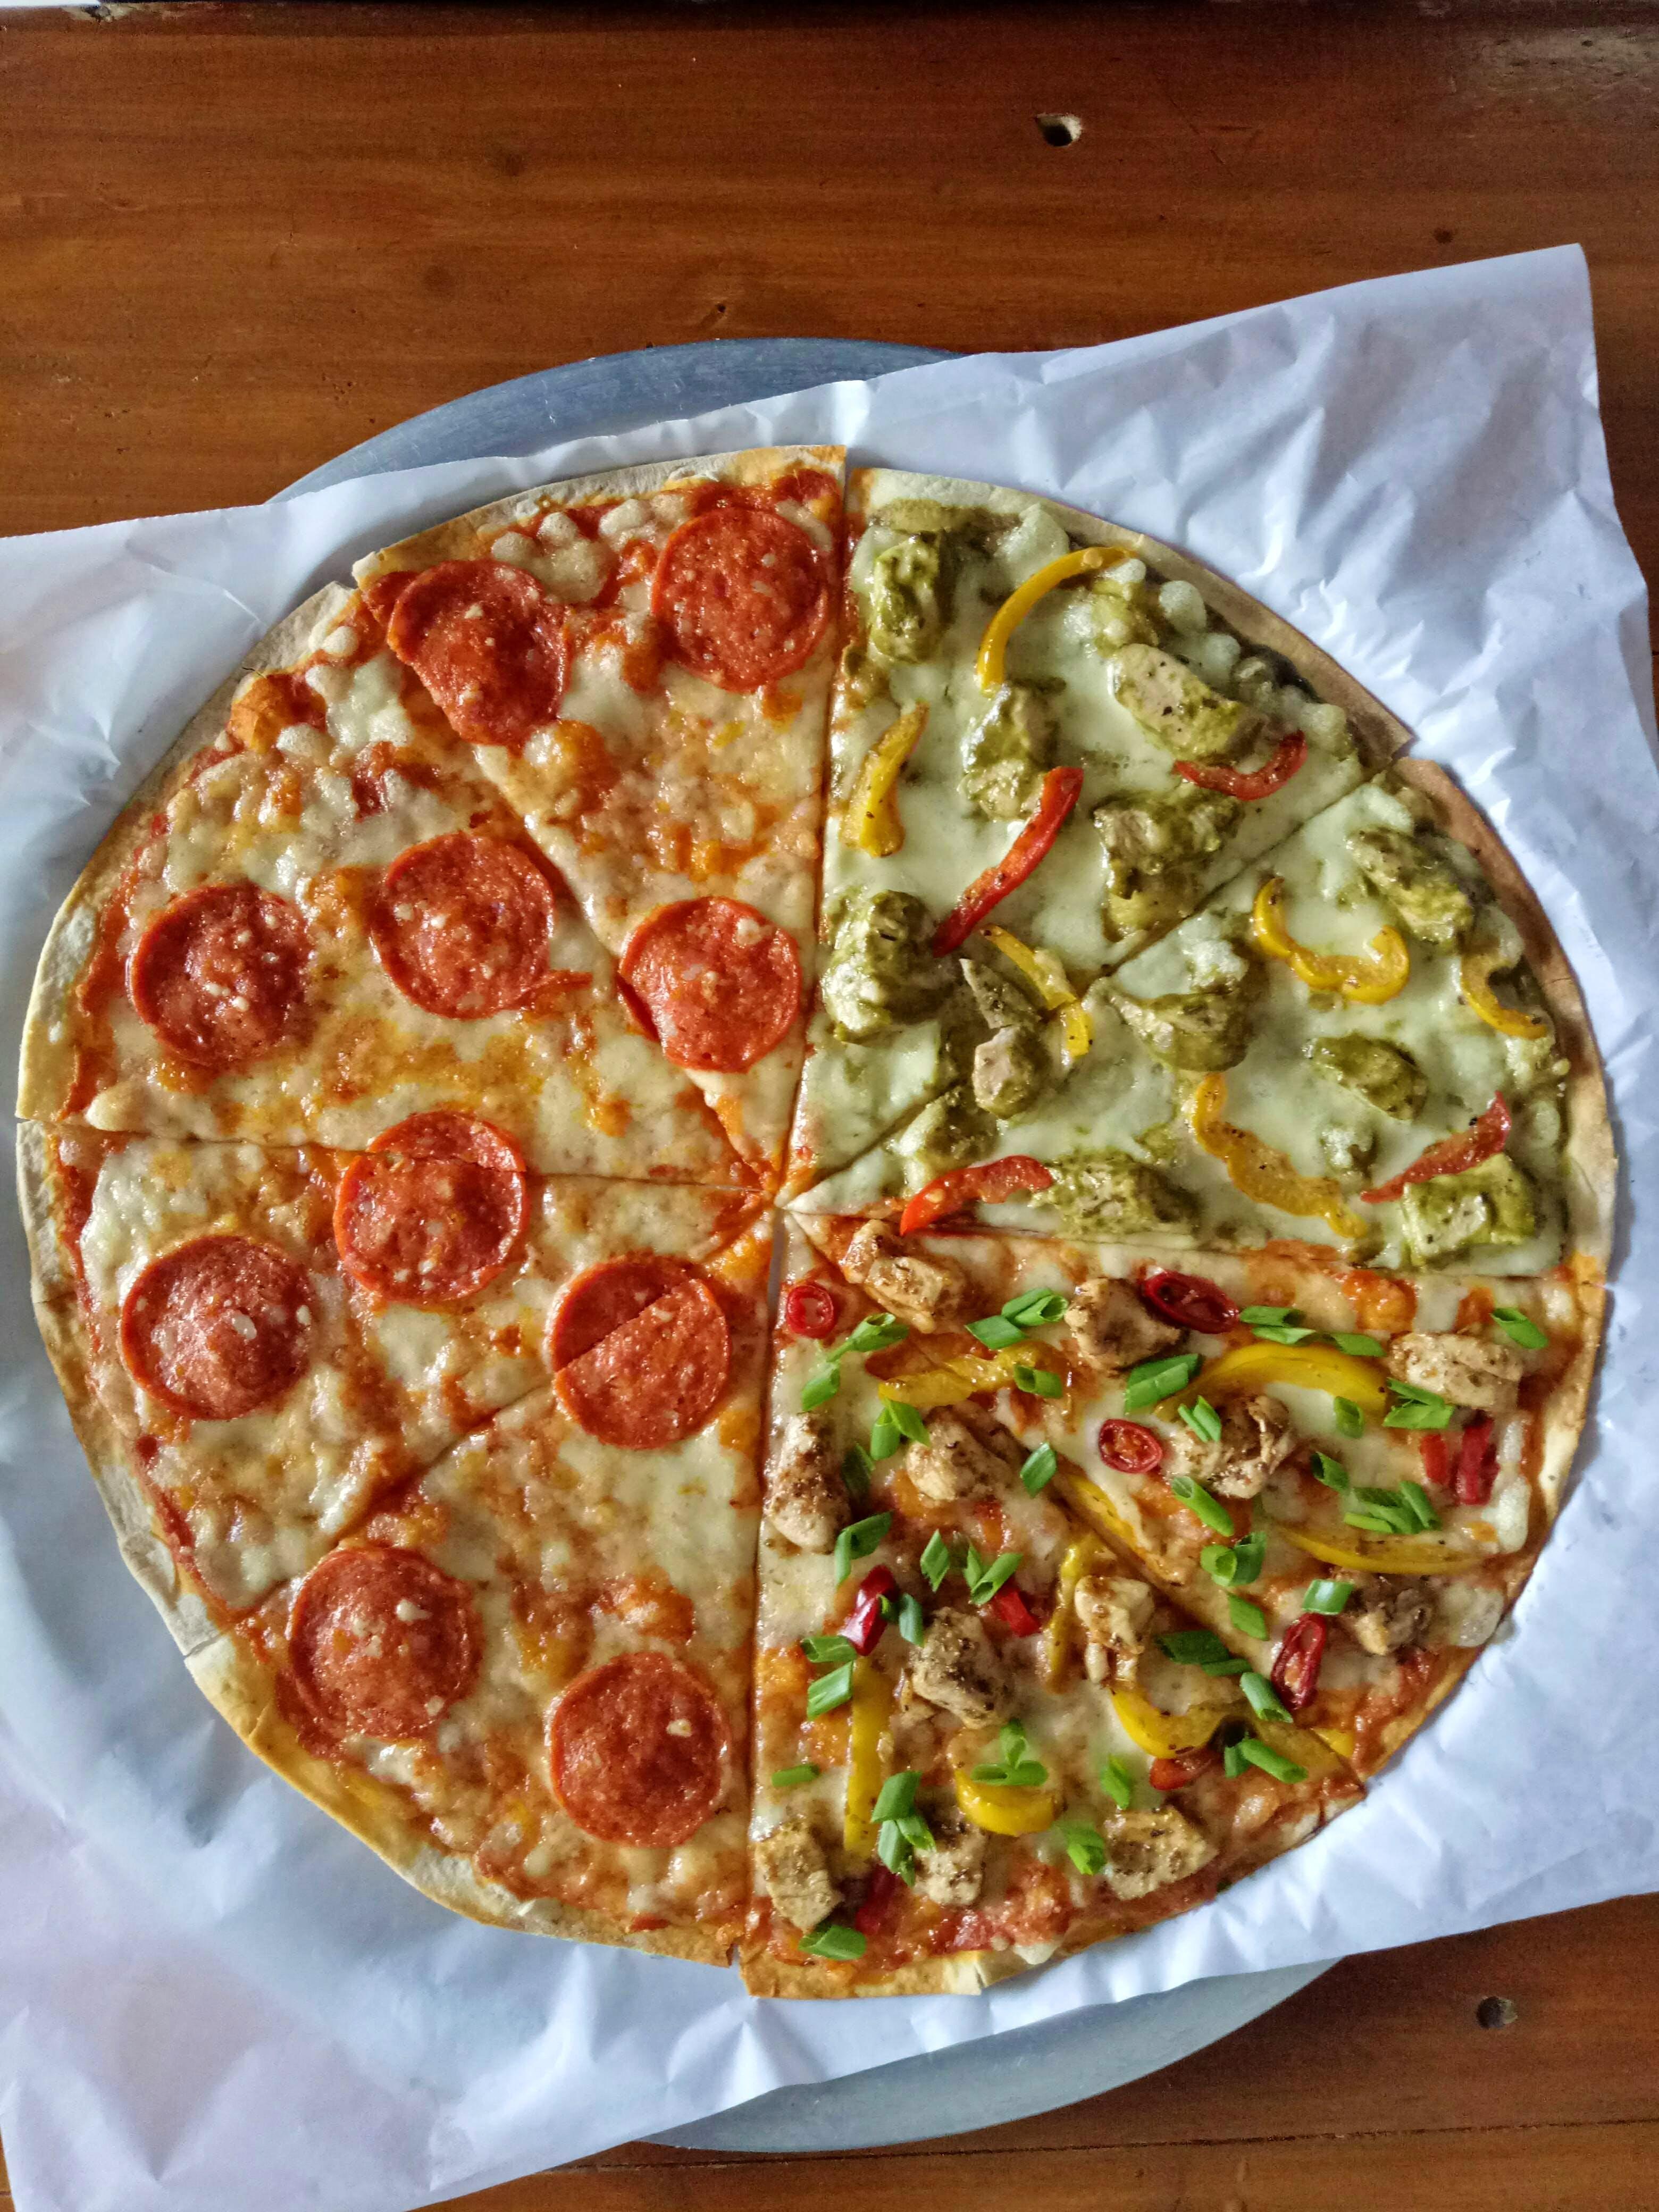 Dish,Pizza,Food,Cuisine,Pizza cheese,Junk food,California-style pizza,Sicilian pizza,Ingredient,Tarte flambée